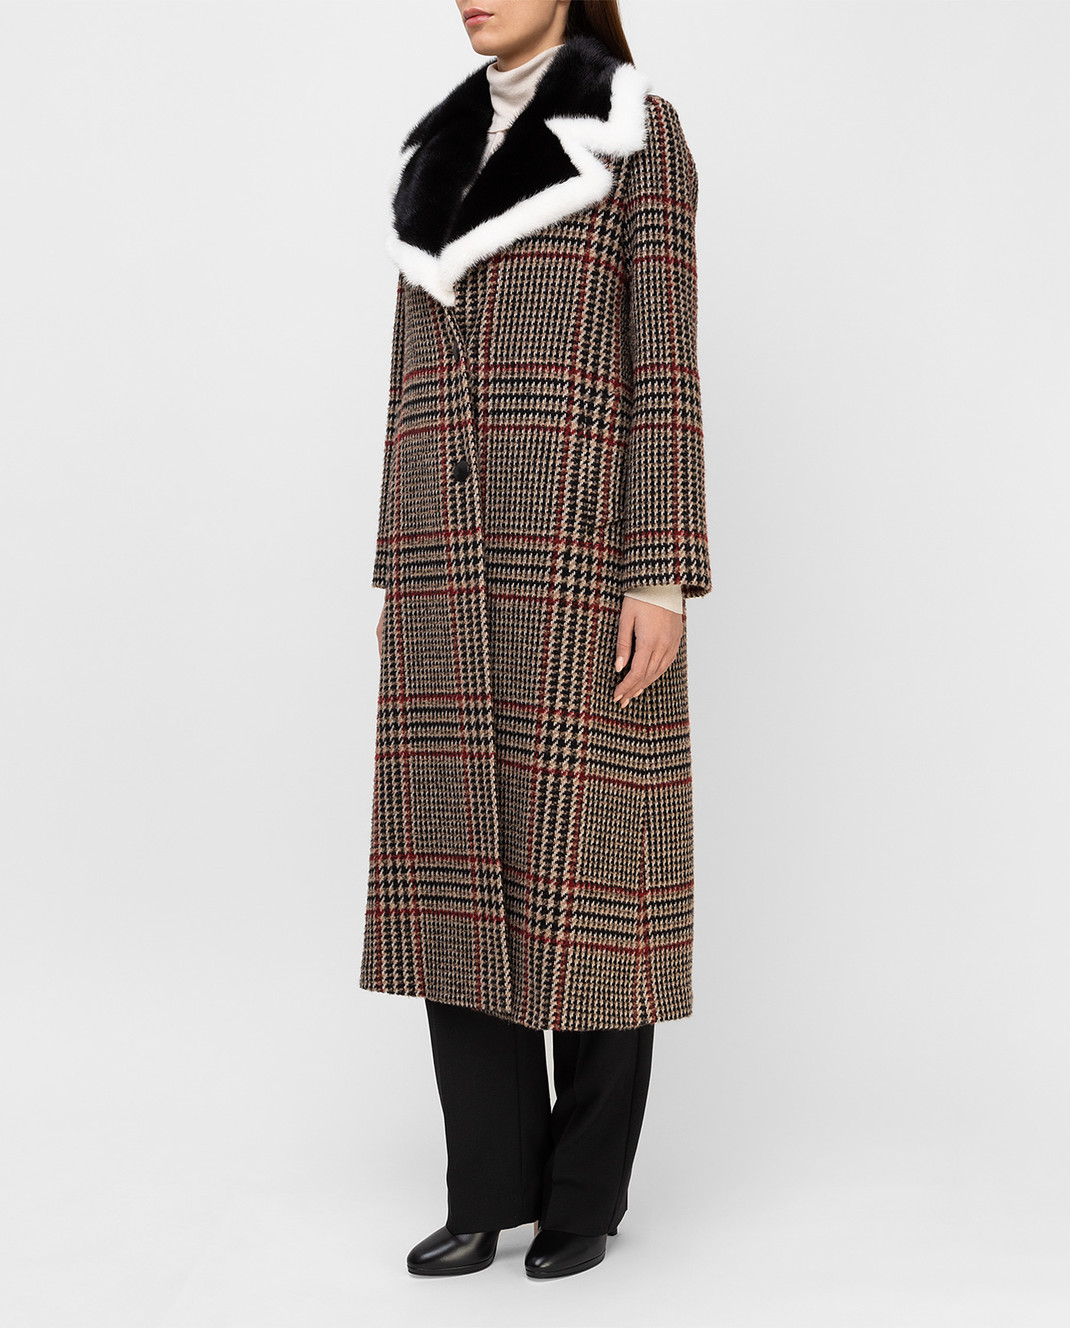 Simonetta Ravizza Бежевое пальто с мехом норки AZZURRA3 изображение 3